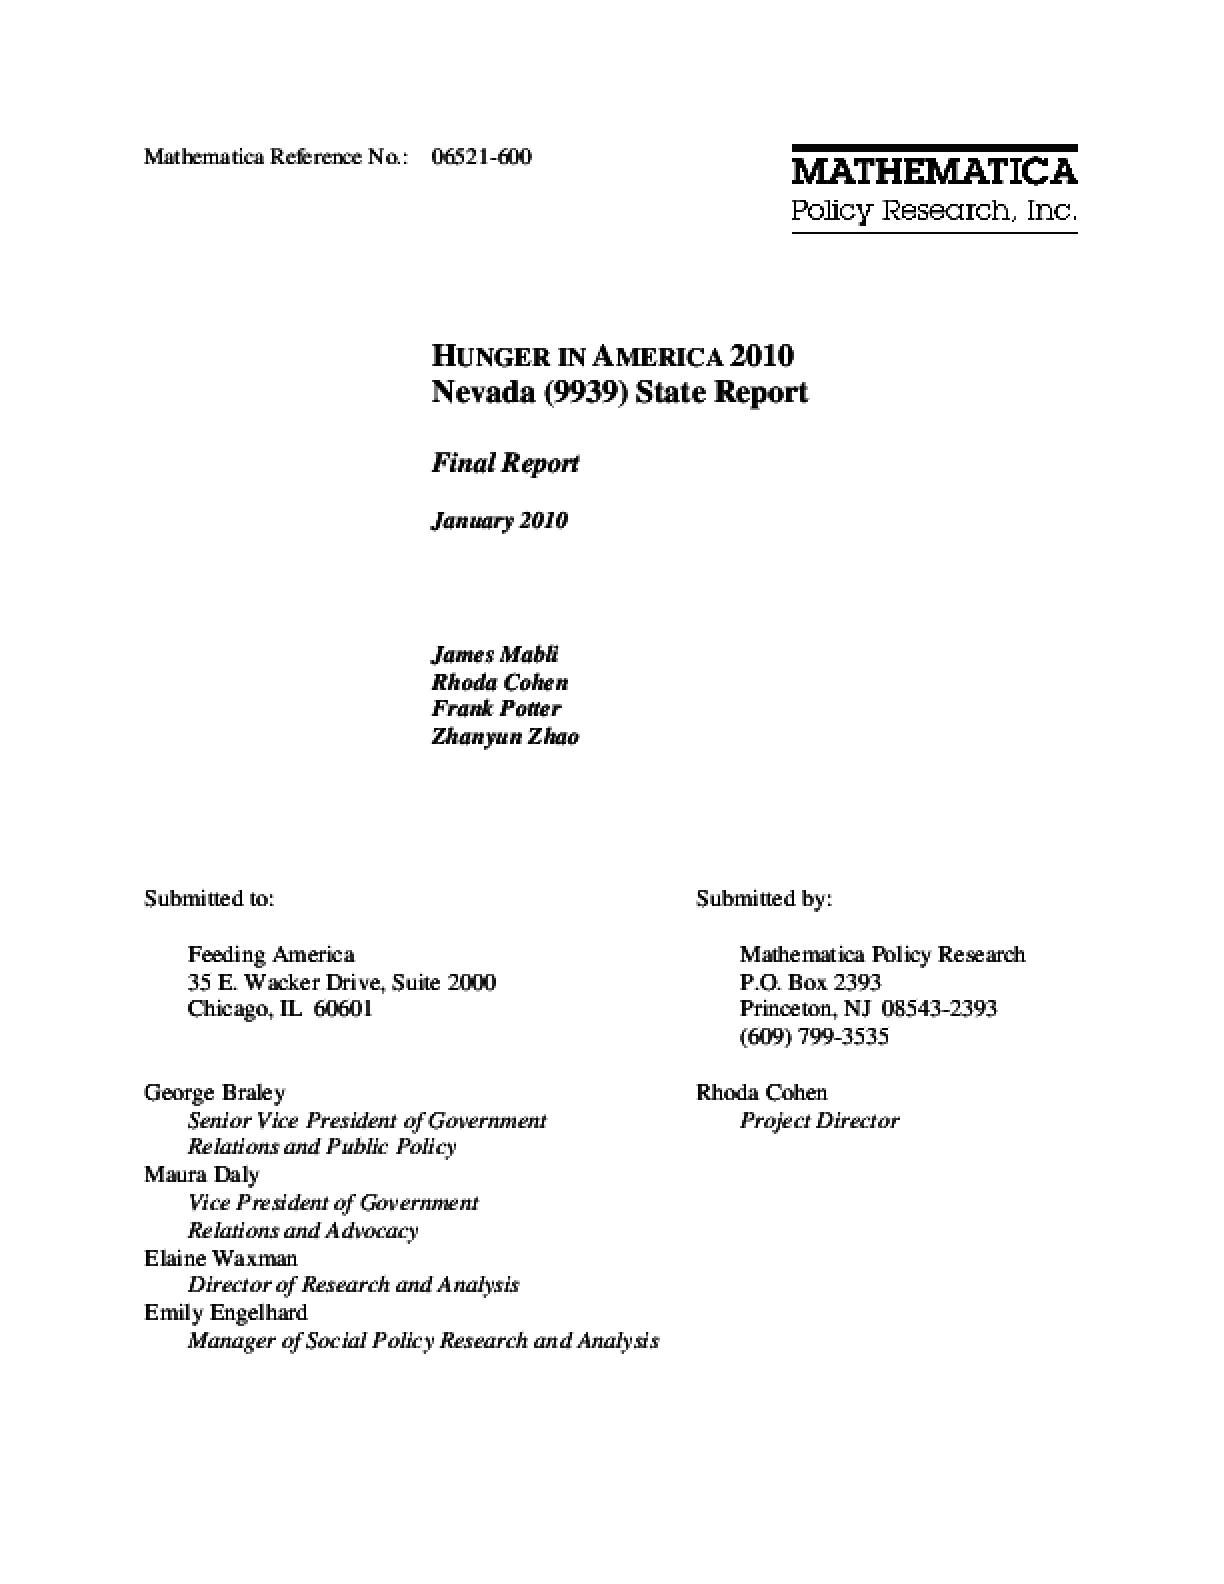 Hunger in America 2010 Nevada State Report